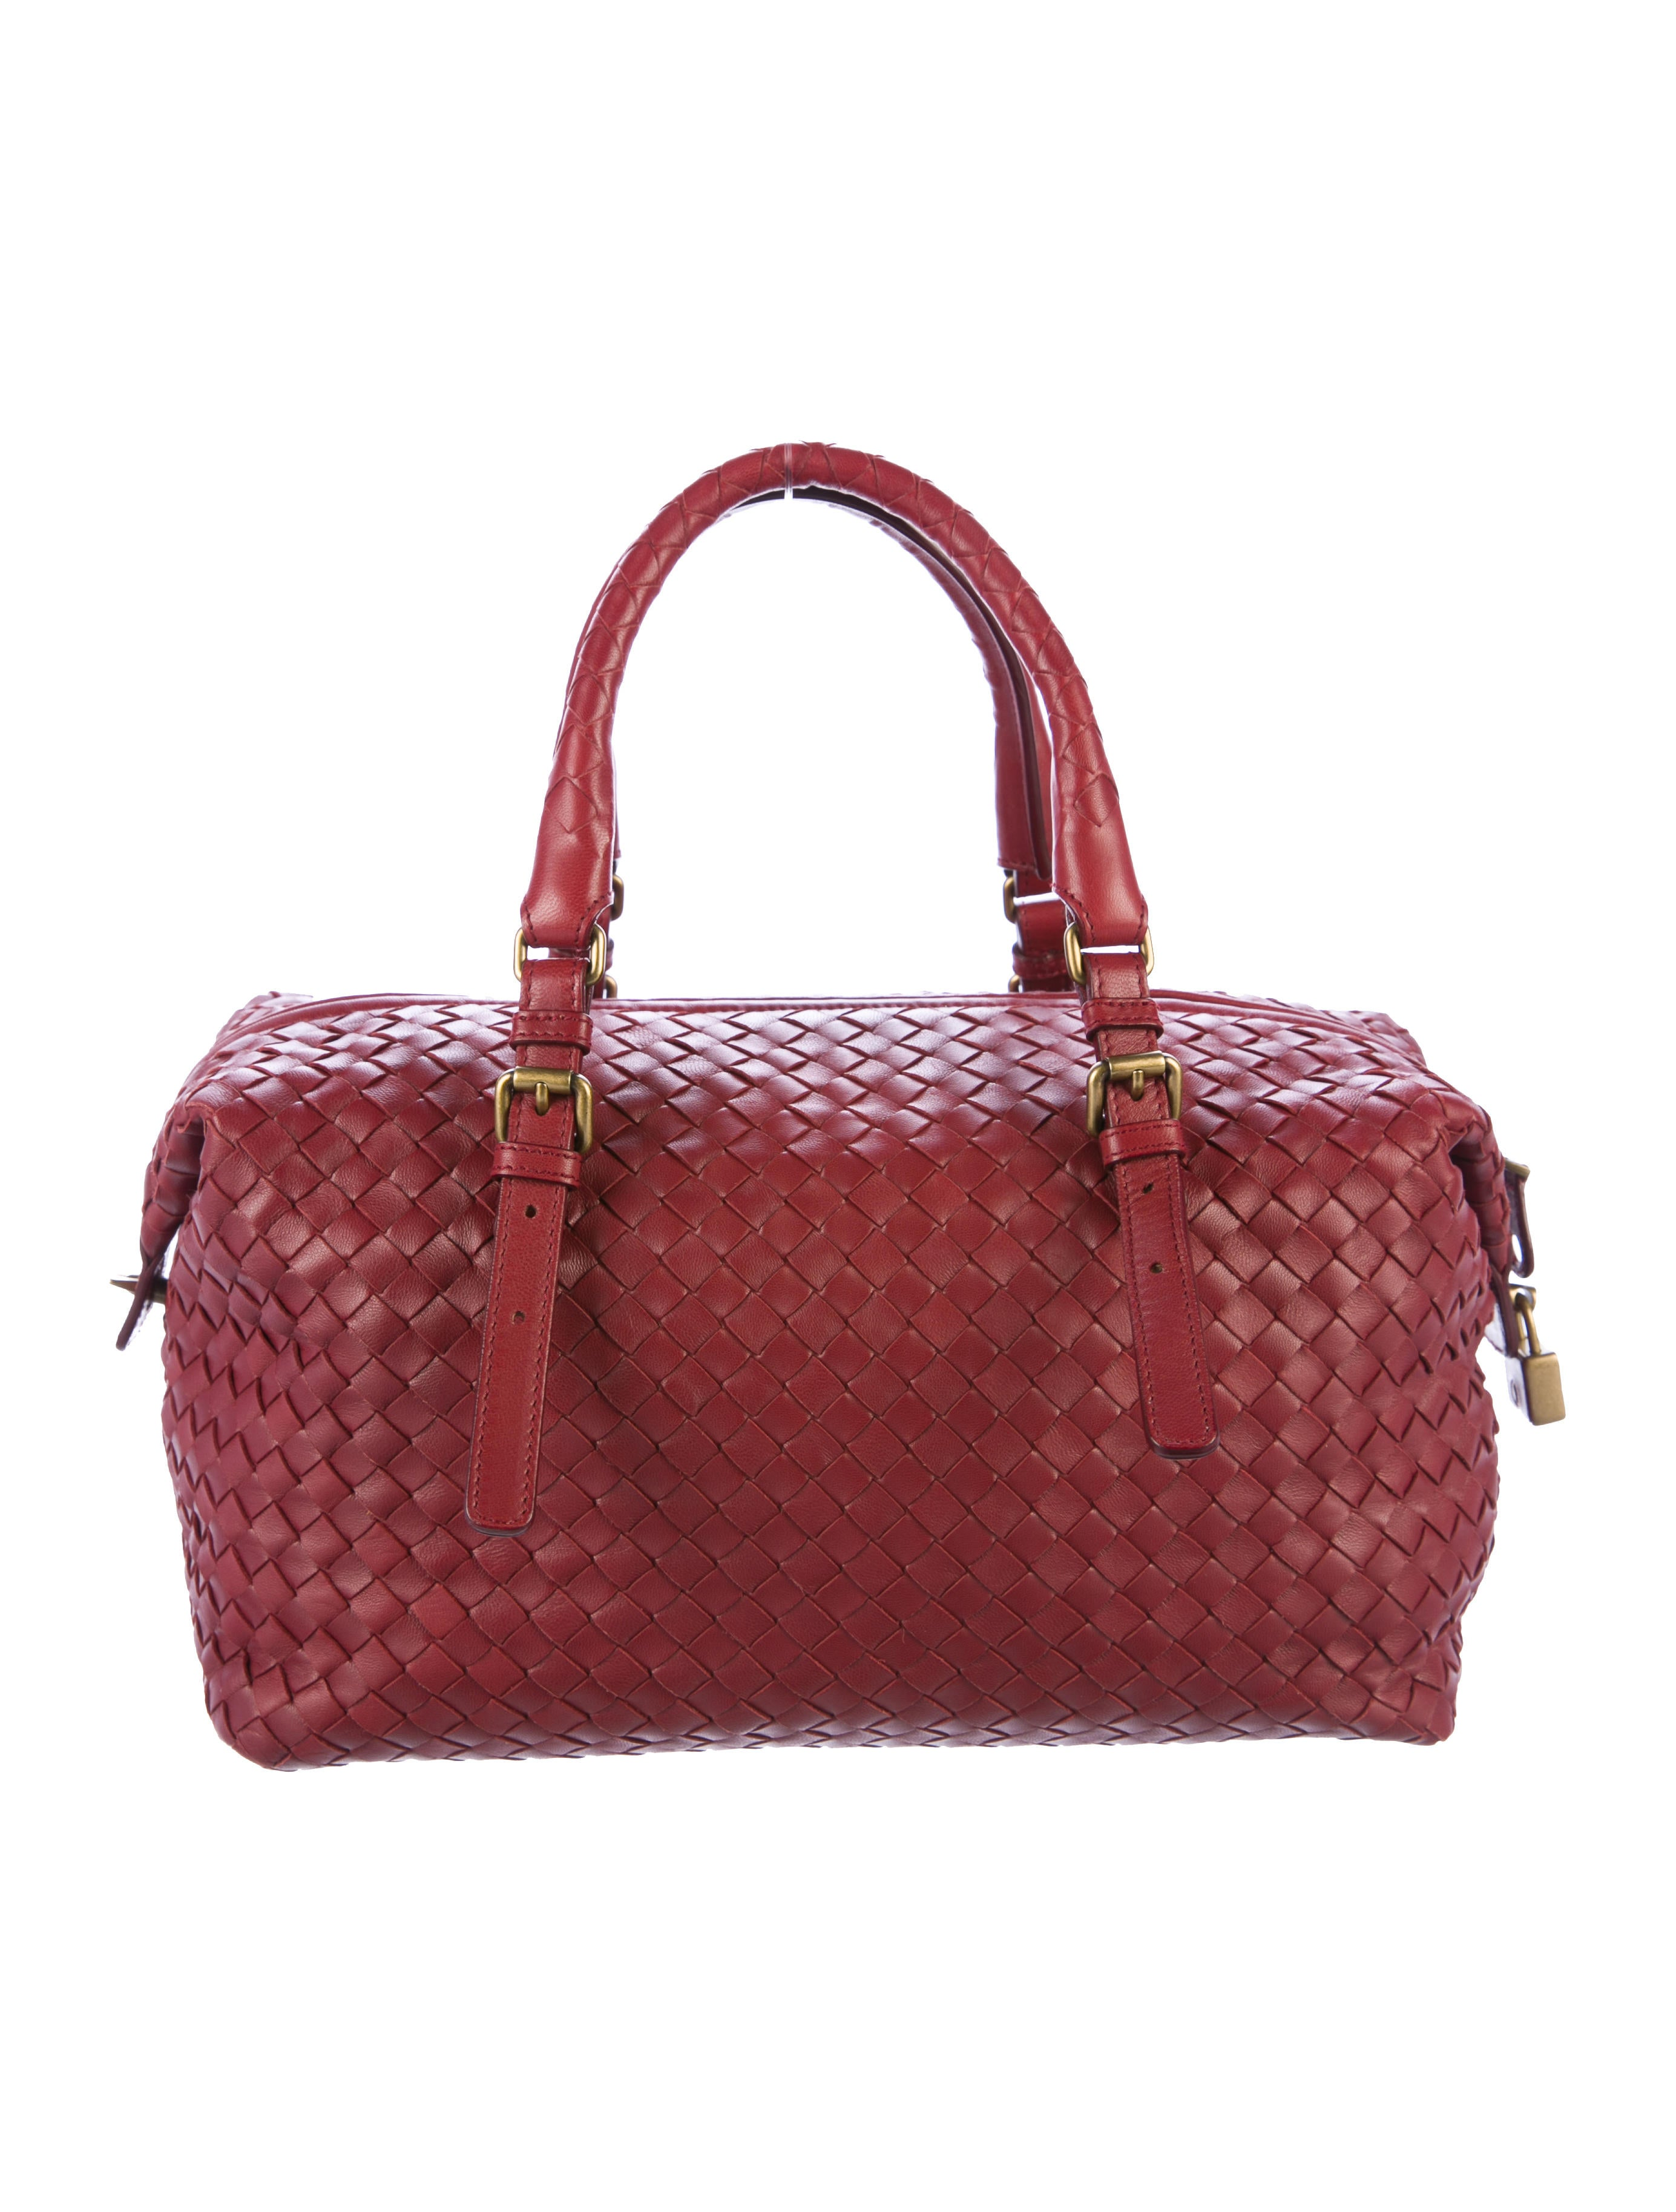 Boston Bag Patchwork Tutorial: Bottega Veneta Intrecciato Boston Bag